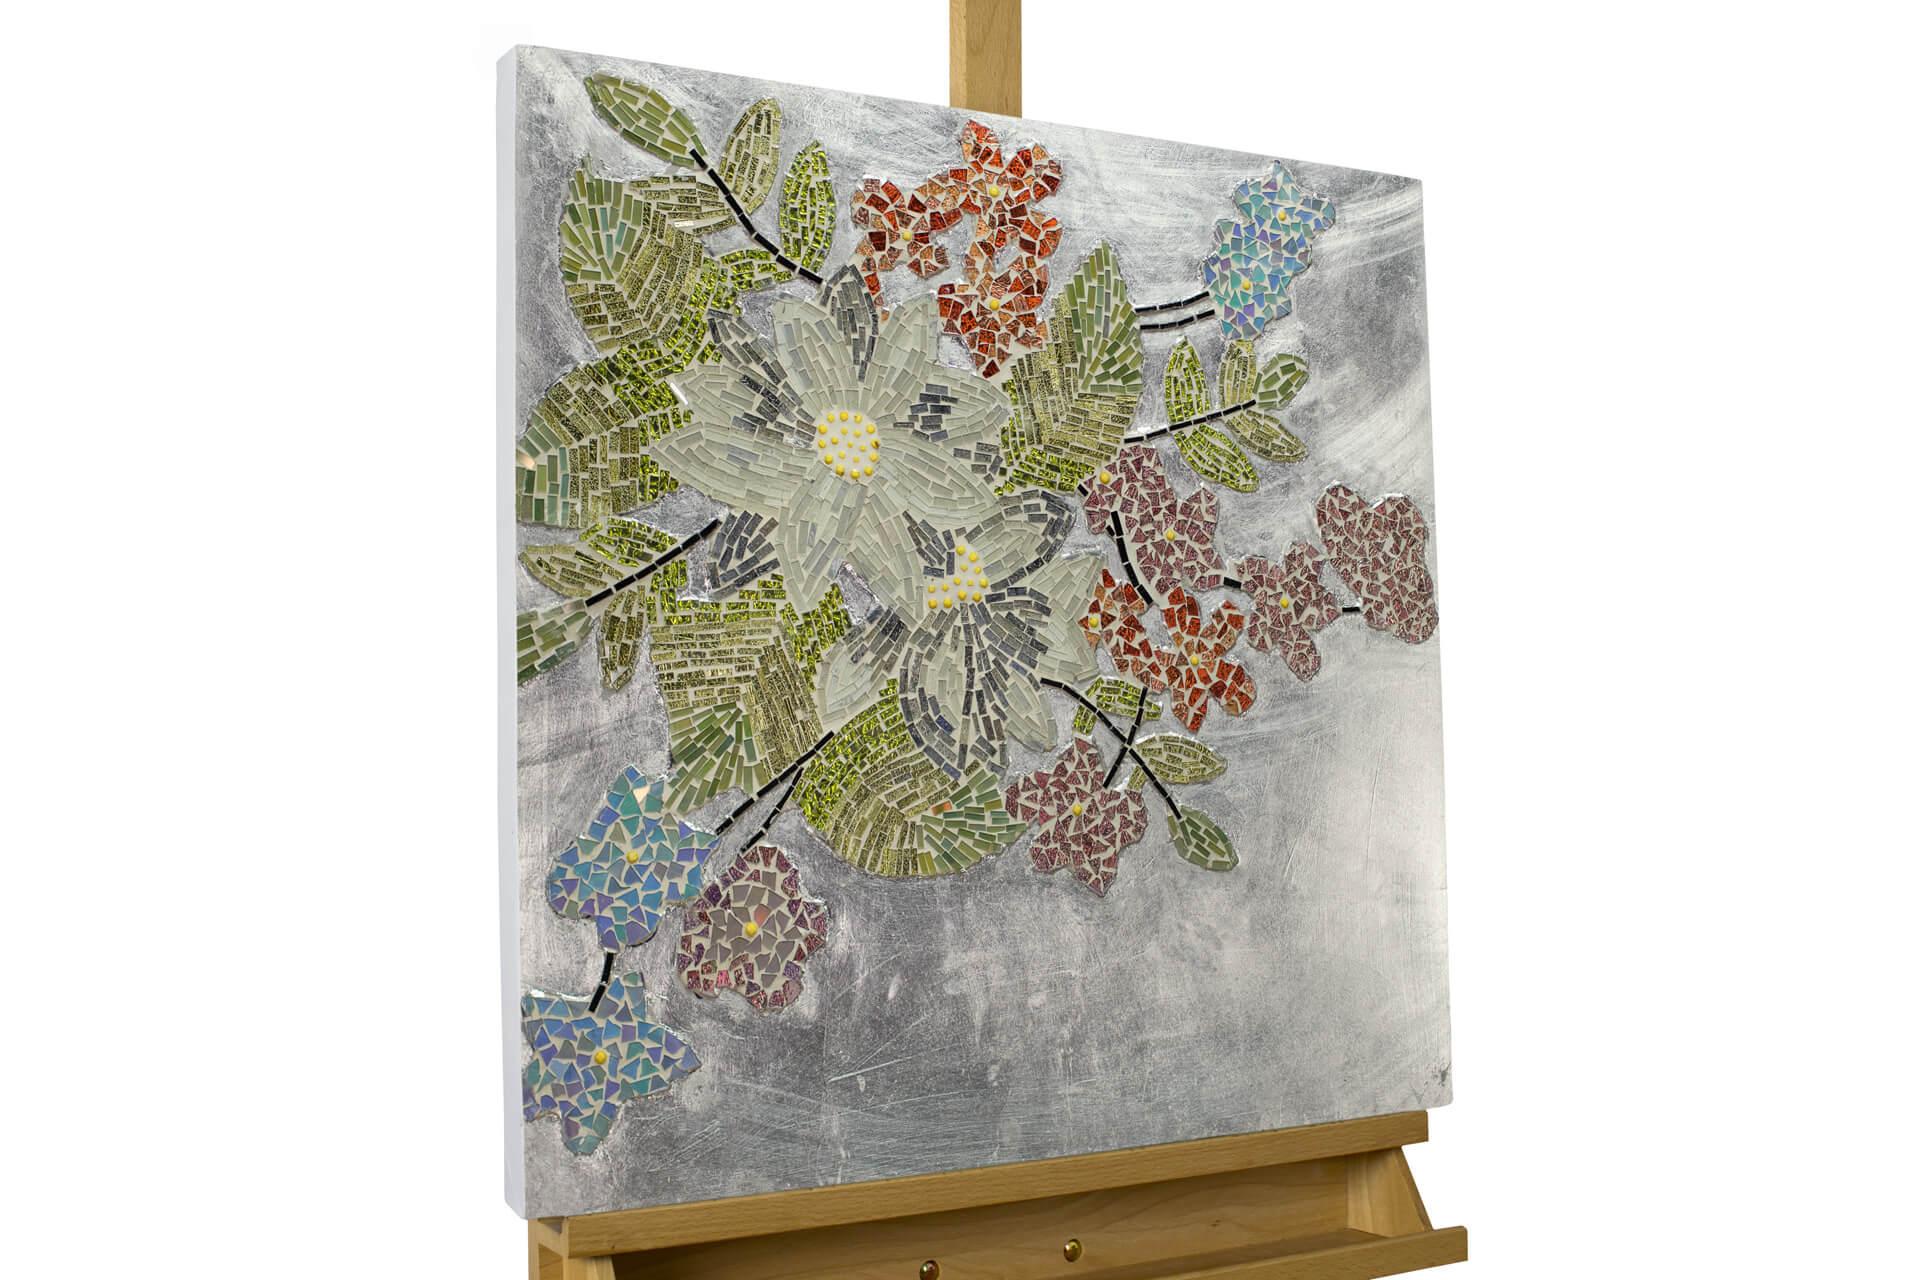 Baum Deko Garten Einzigartig Mosaic Wall Art Wondrous Blooms 24x24x2 Inches